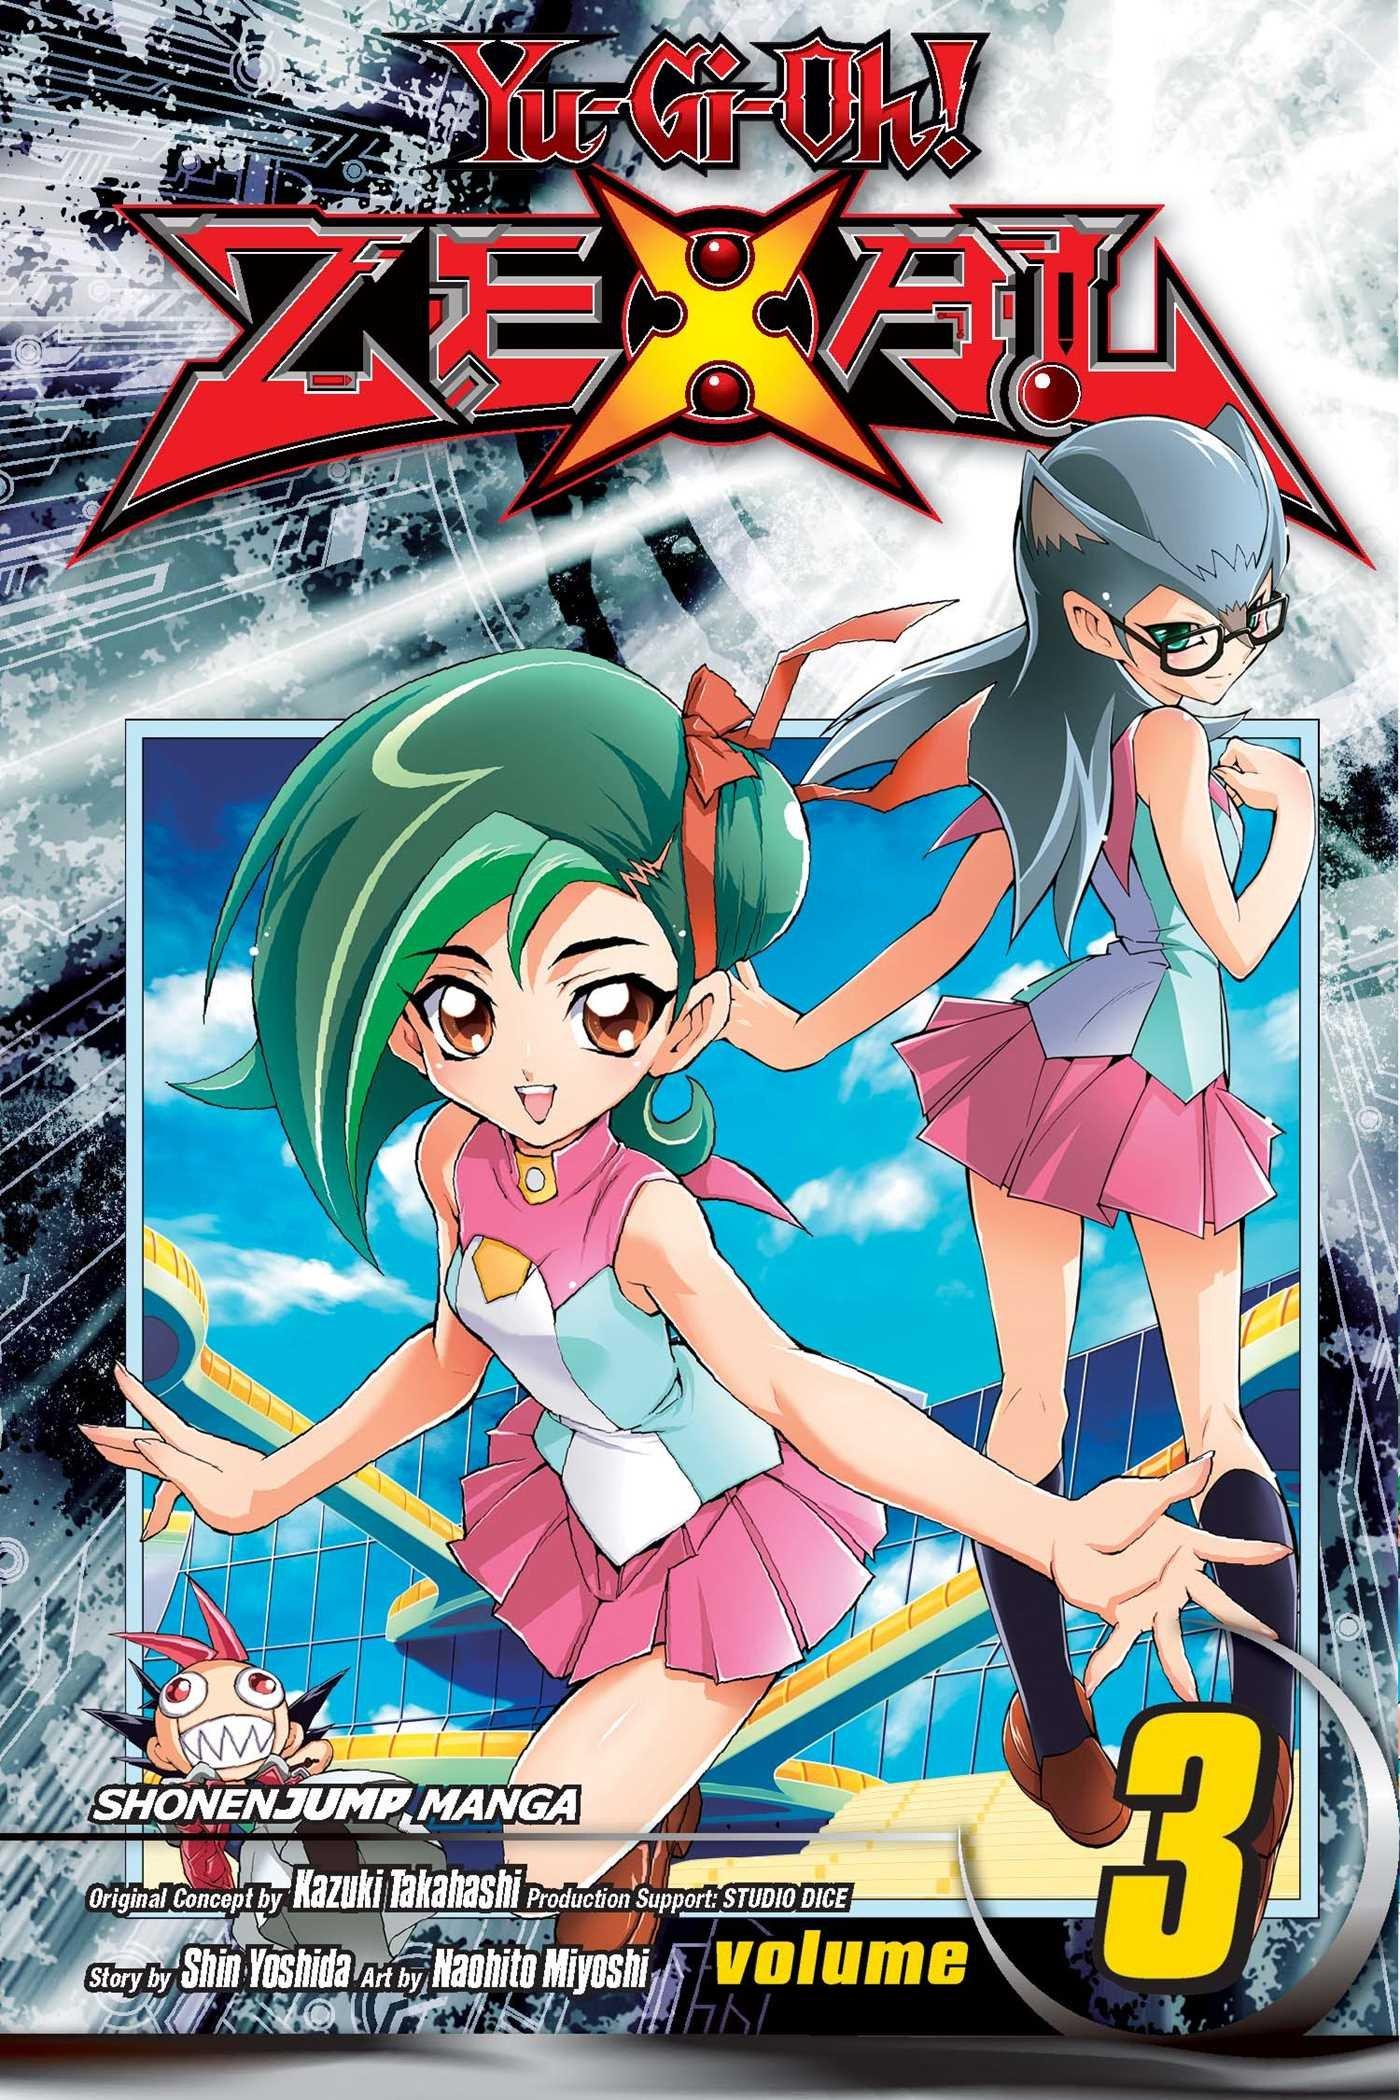 yu-gi-oh! zexal, anime, manga, cards, reviews, kotori mizuki, tori meadows